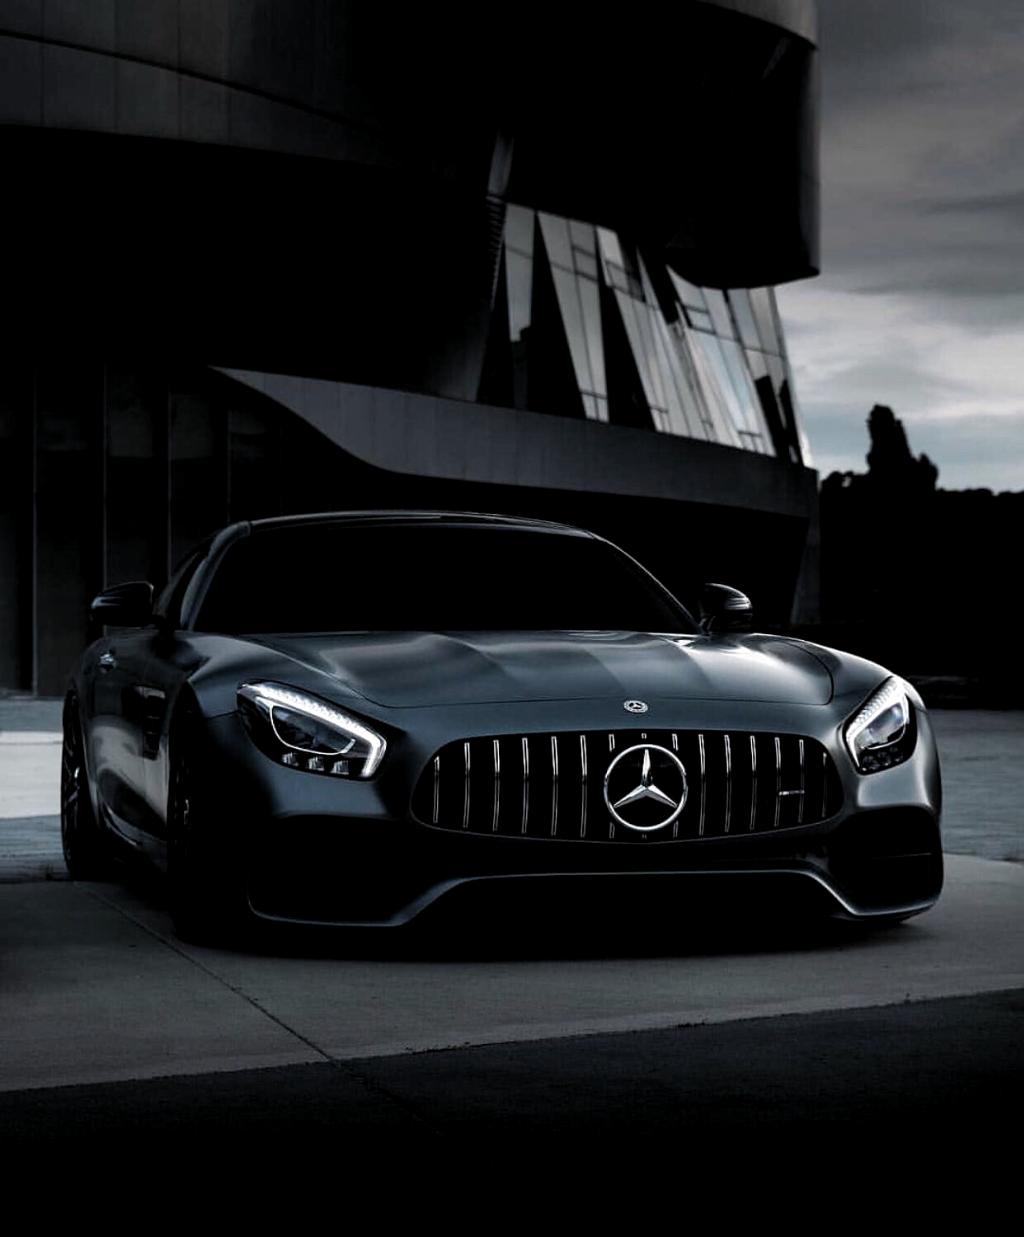 Photo of #メルセデス#メルセデス-ベンツ#mercedesamg#mercedesbenzamg#黒#amg#車#の高級#luxurycars